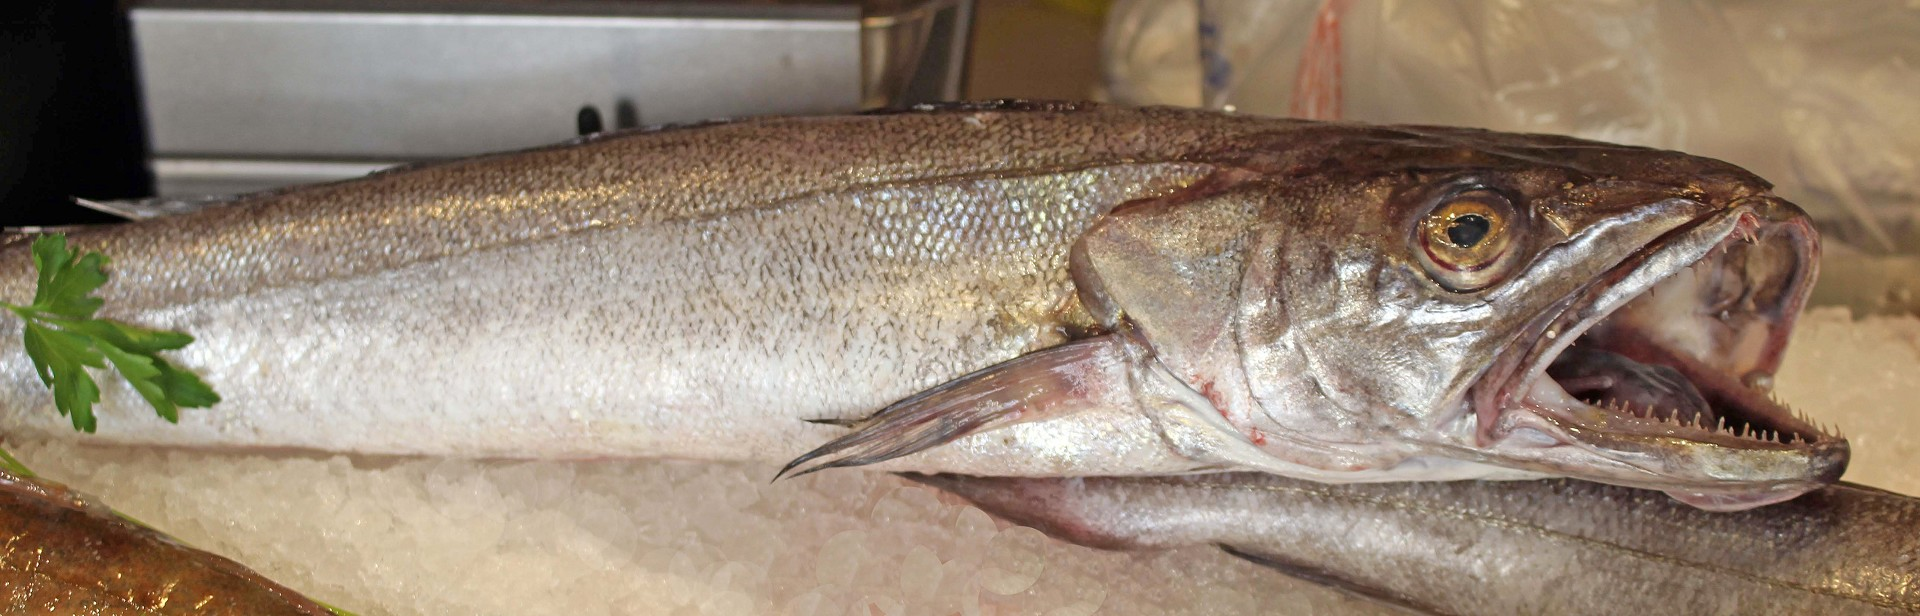 Stefano pescherie nasello cucinare nasello pesce per for Comprare pesci